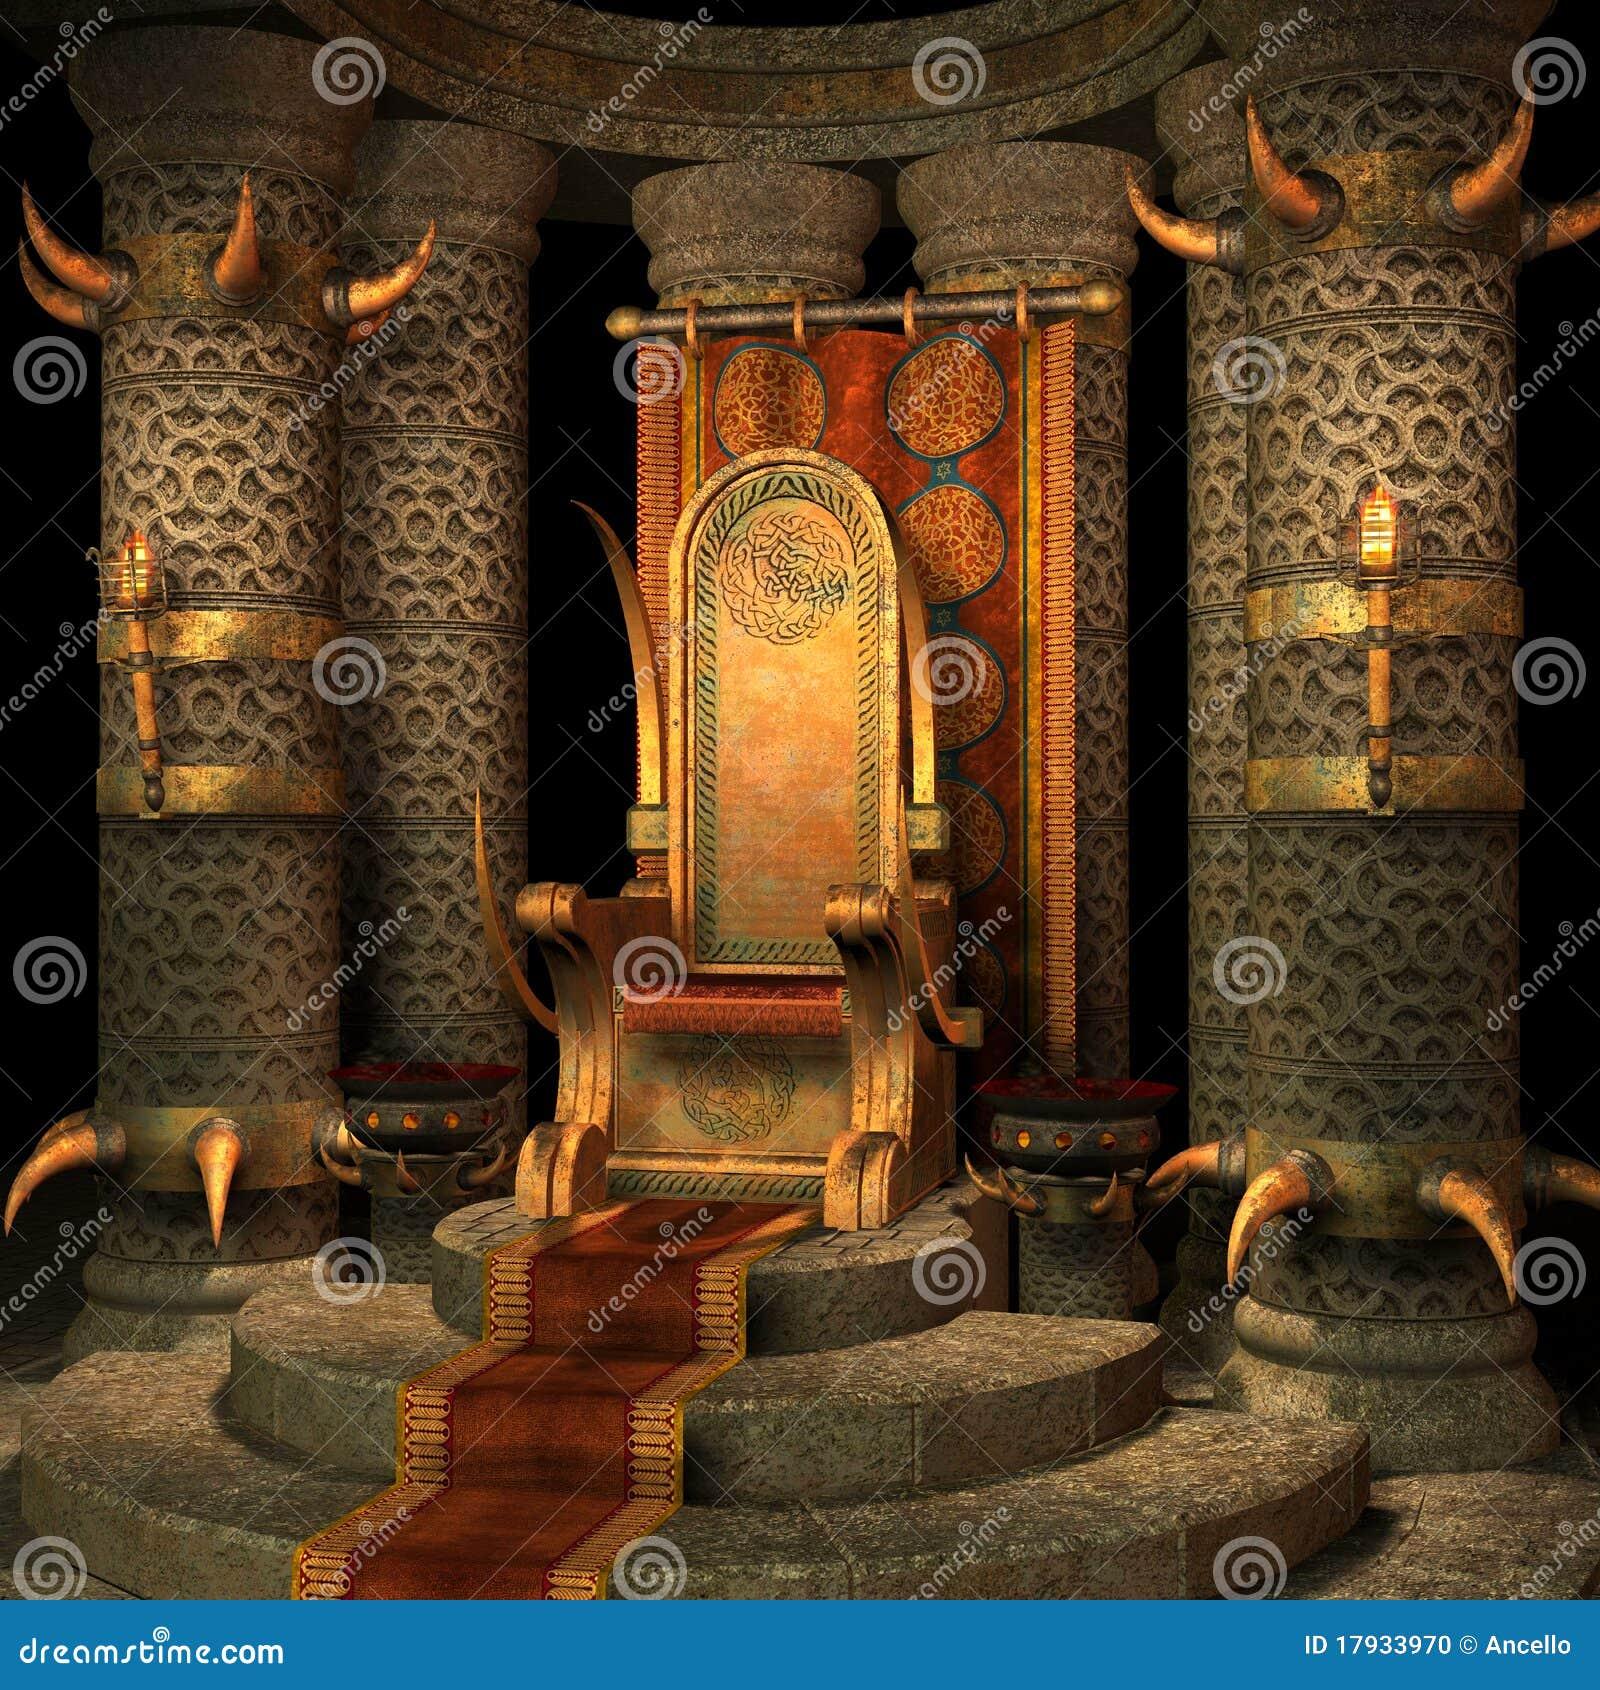 King S Room Fantasy